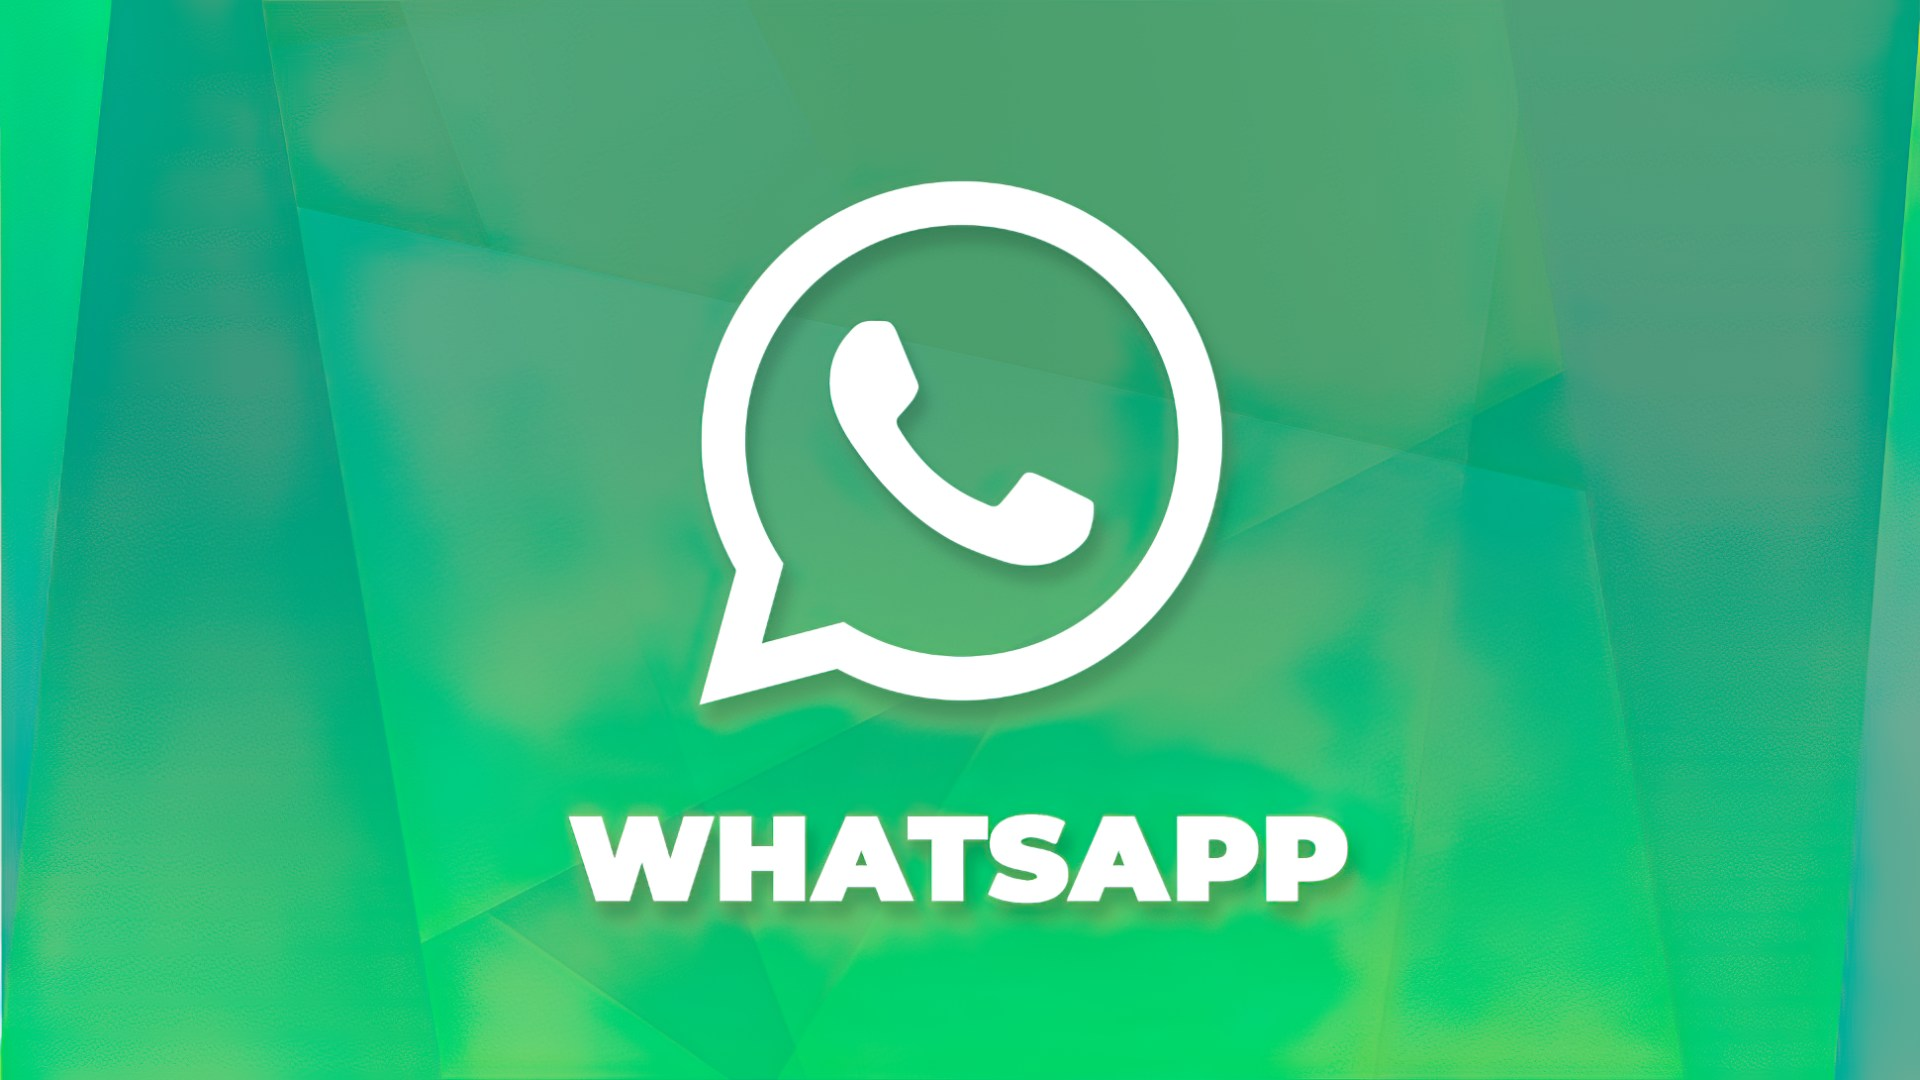 App, Social Network, Messenger, Chat, whatsapp, Instant Messaging, Social Media, Voip, Videotelefonie, 739699, Internettelefonie, WhatsApp Web